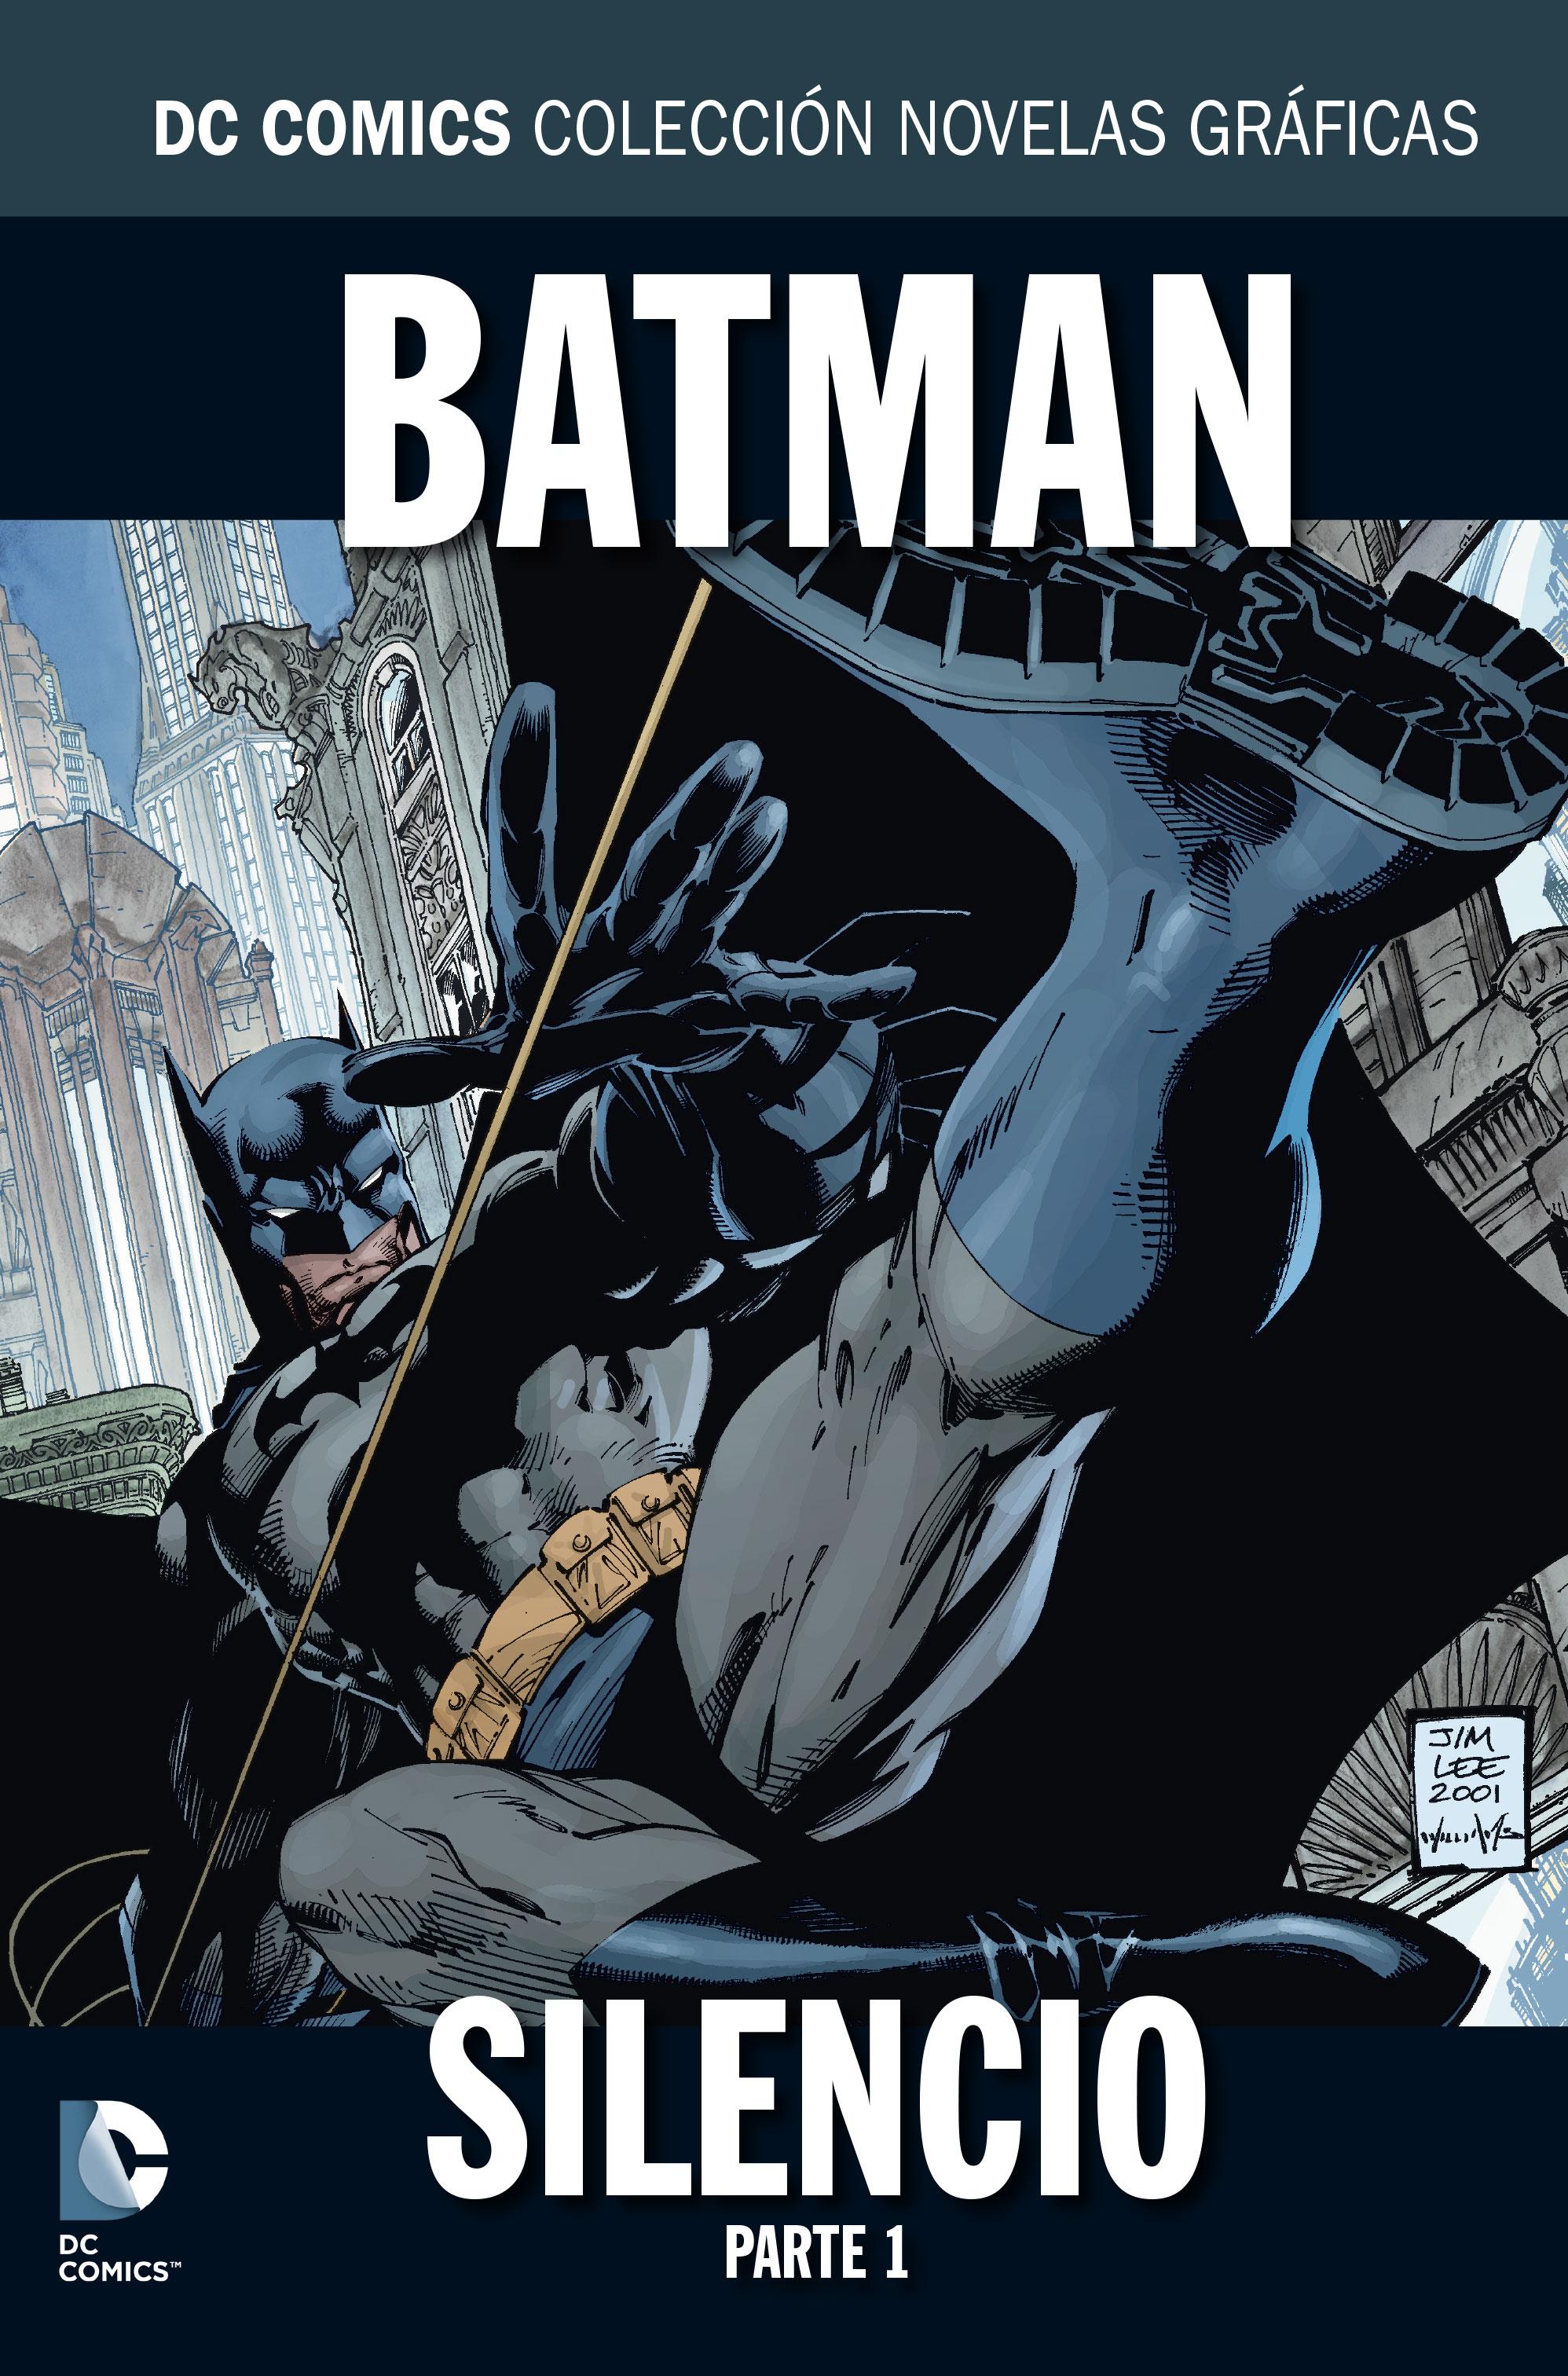 836 - [DC - Salvat] La Colección de Novelas Gráficas de DC Comics  BatmanSilencioParte1